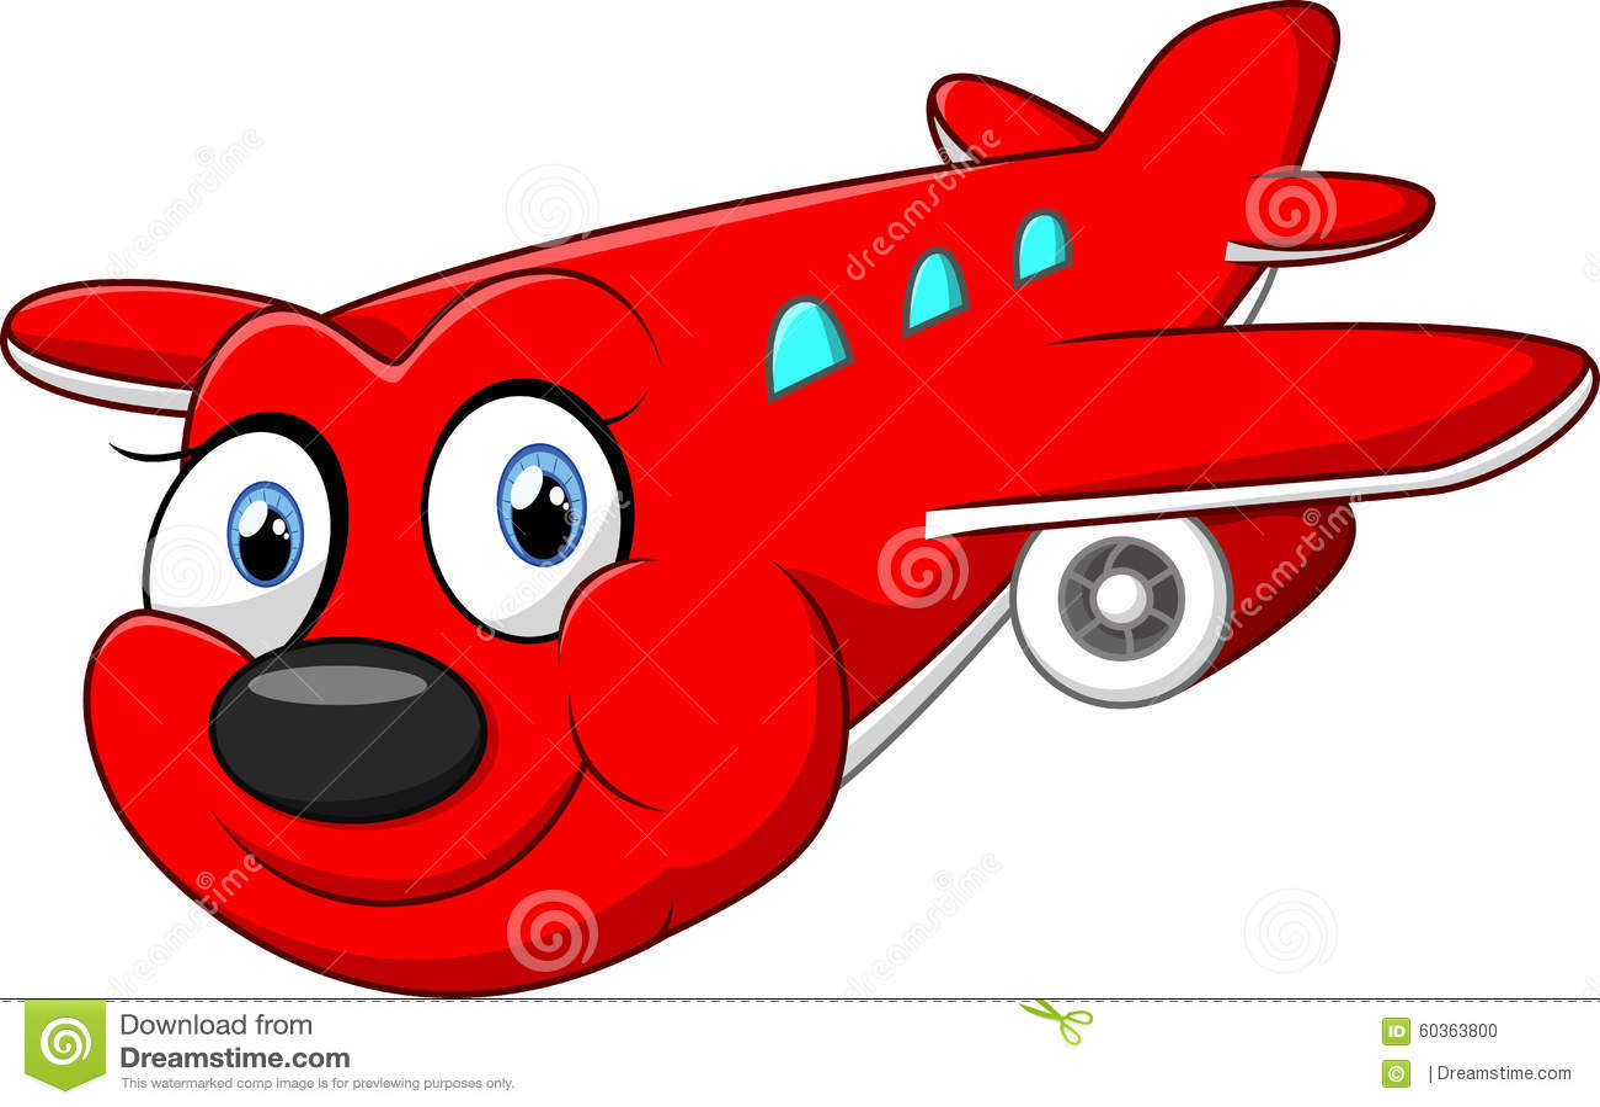 Plane Clipart No Background